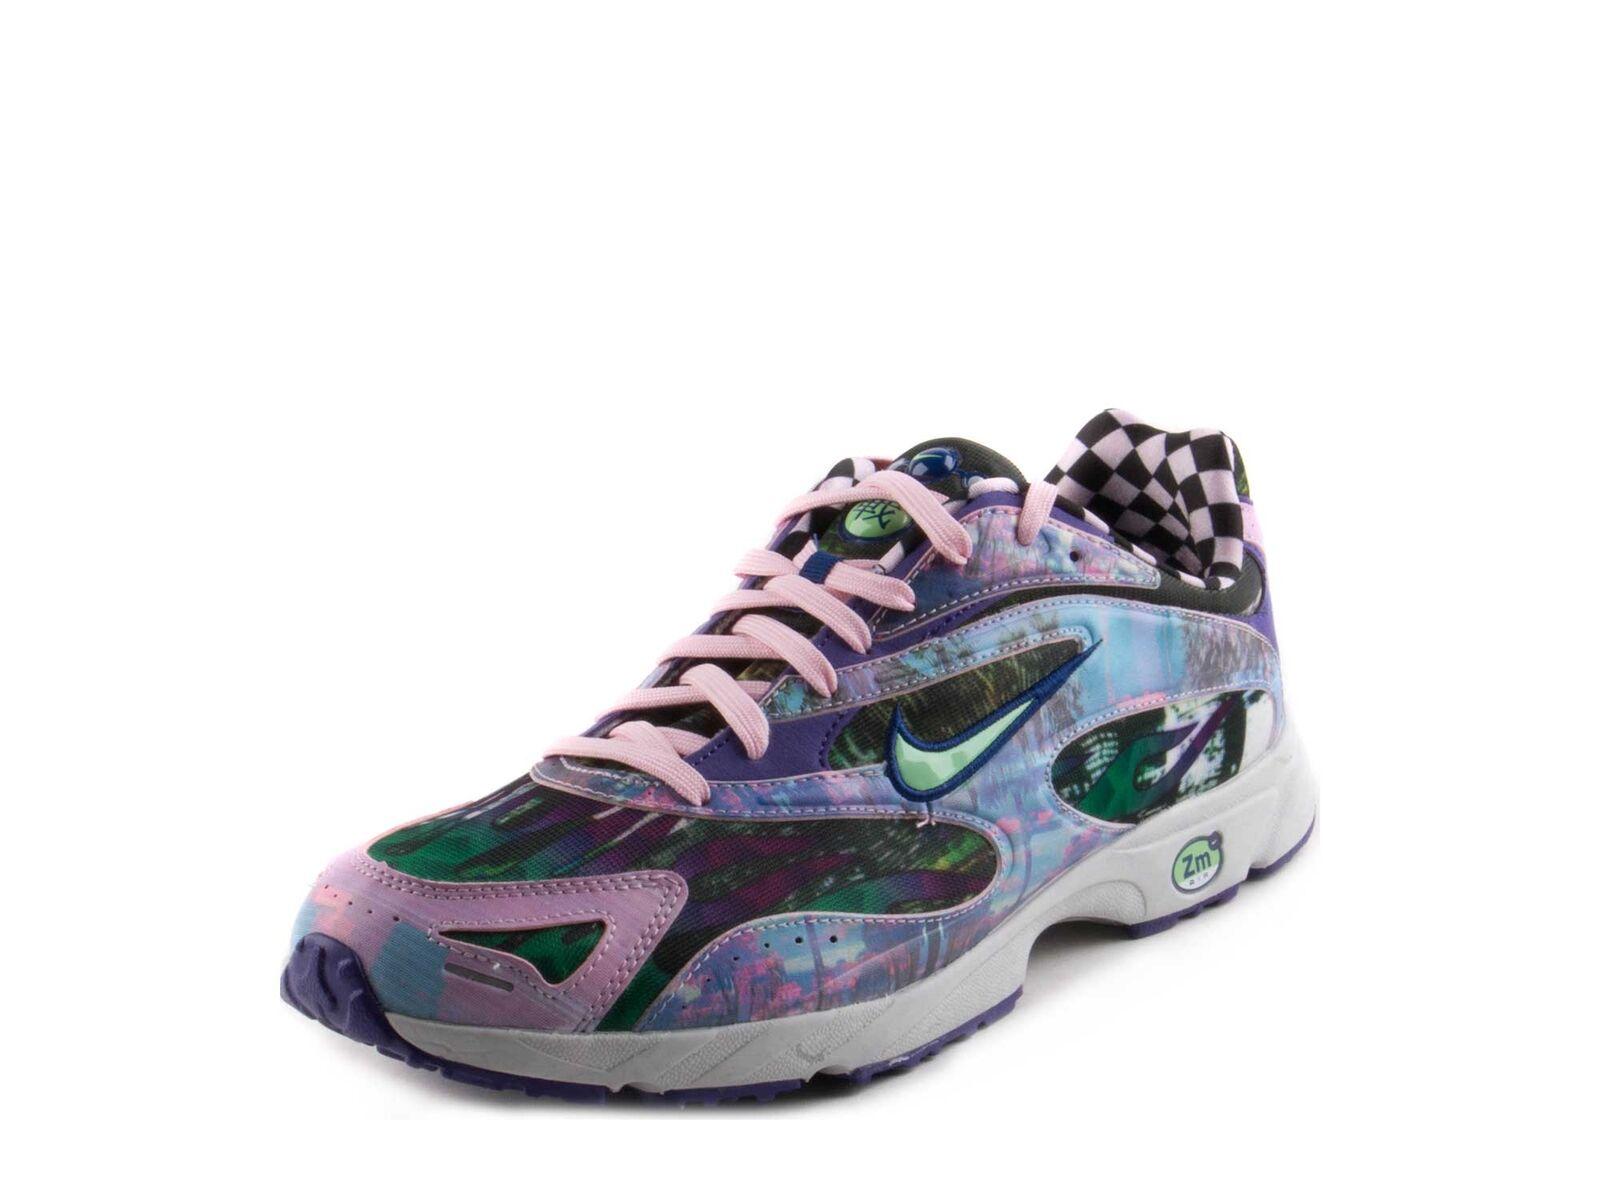 Nike Mens ZM Streak Spectrum Plus Prem Court Purple LT Poison Green AR1533-500